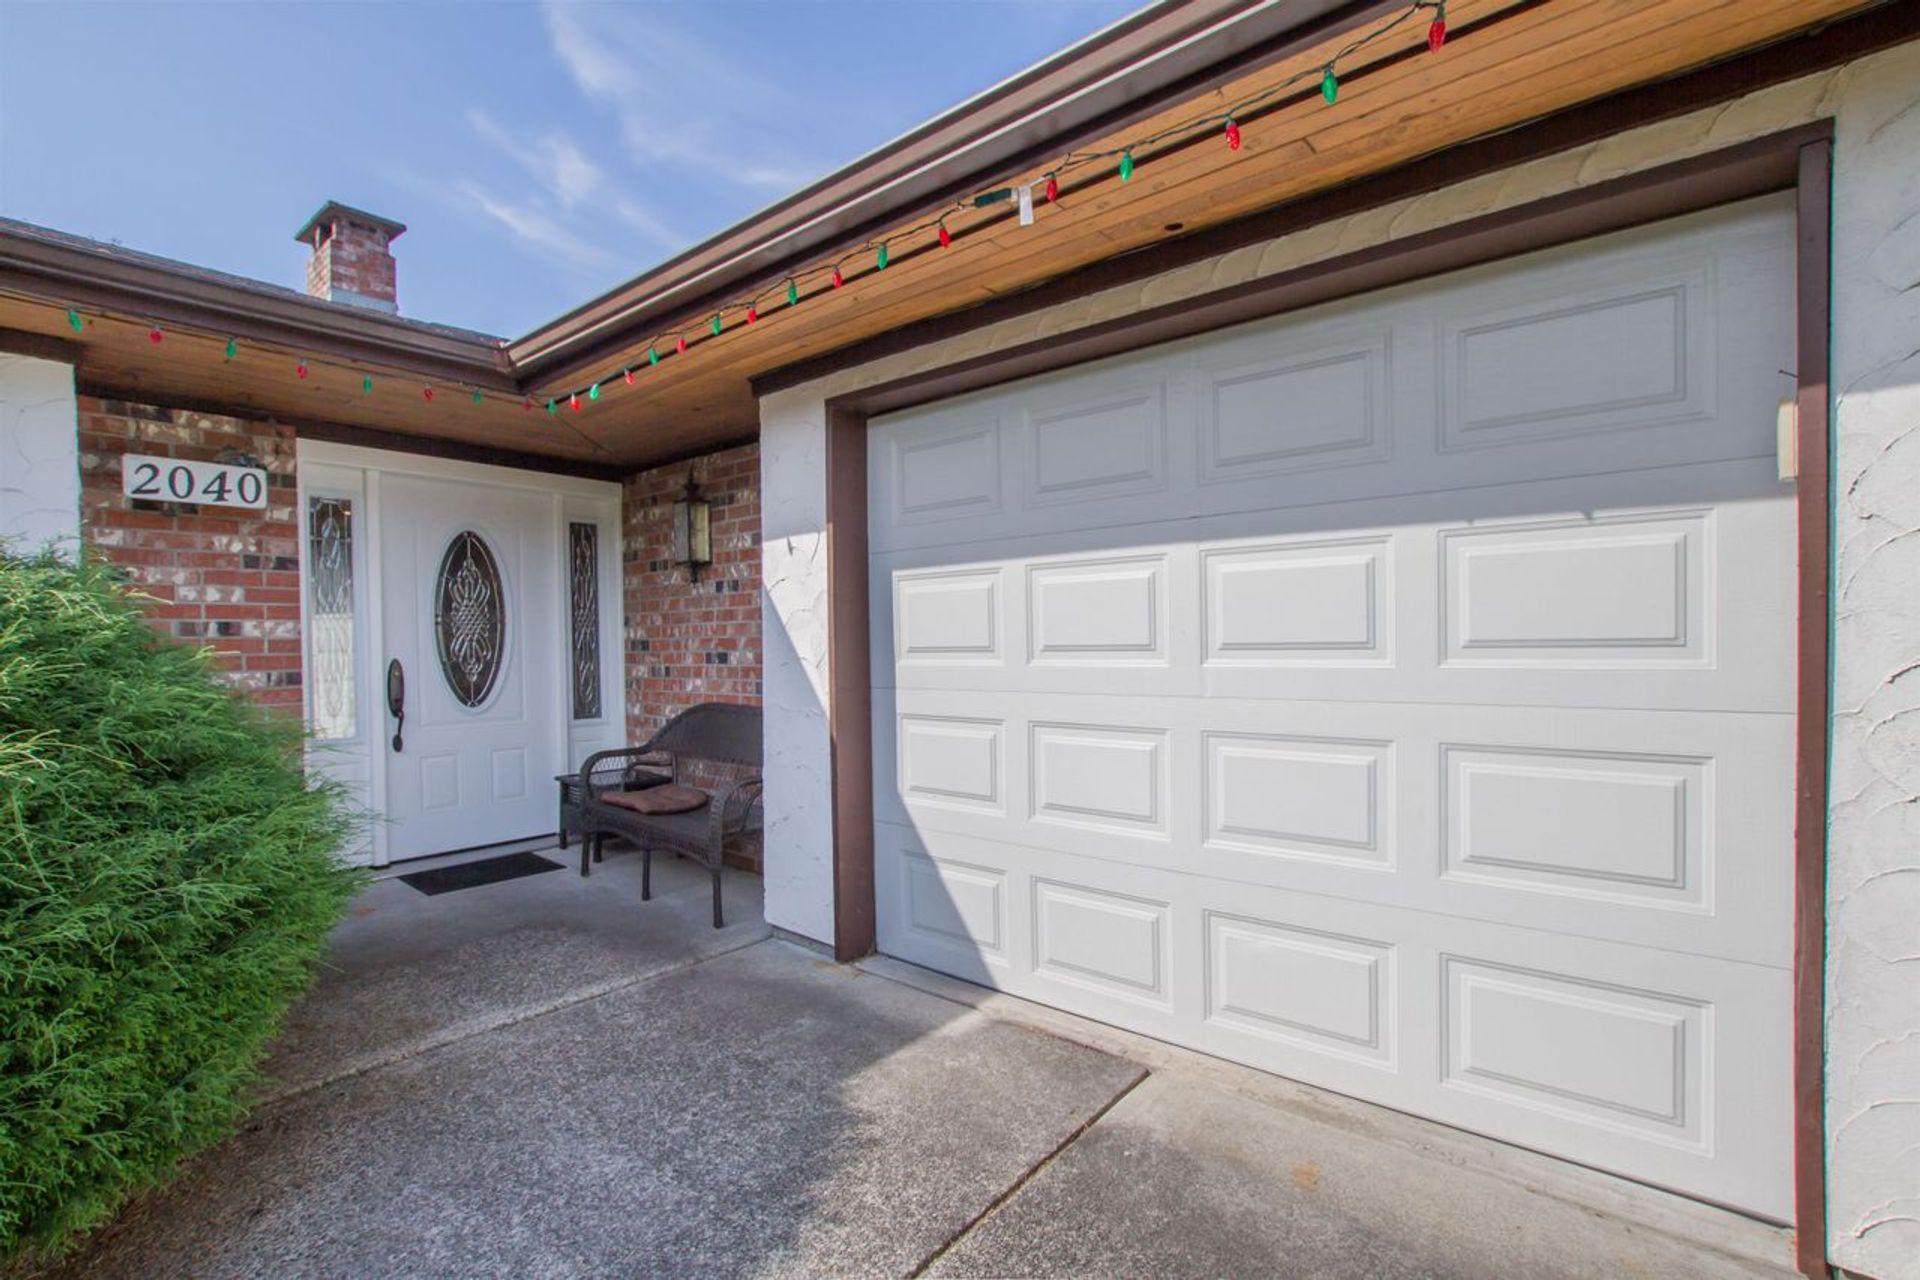 2040-diamond-road-garibaldi-estates-squamish-02 at 2040 Diamond Road, Garibaldi Estates, Squamish